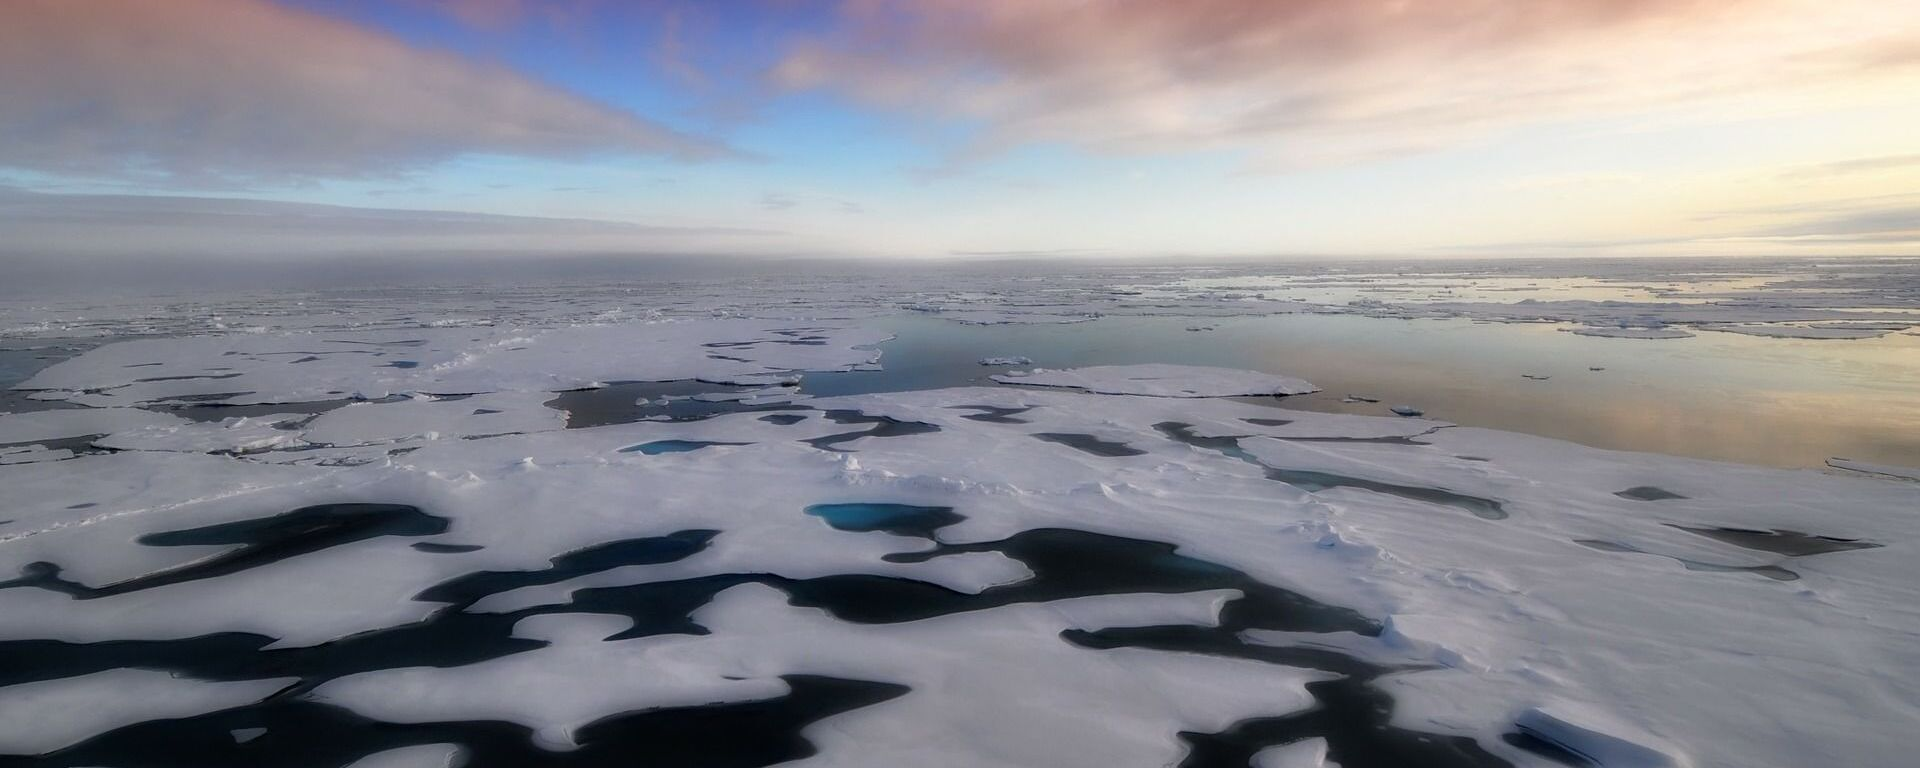 Ártico - Sputnik Mundo, 1920, 29.06.2021